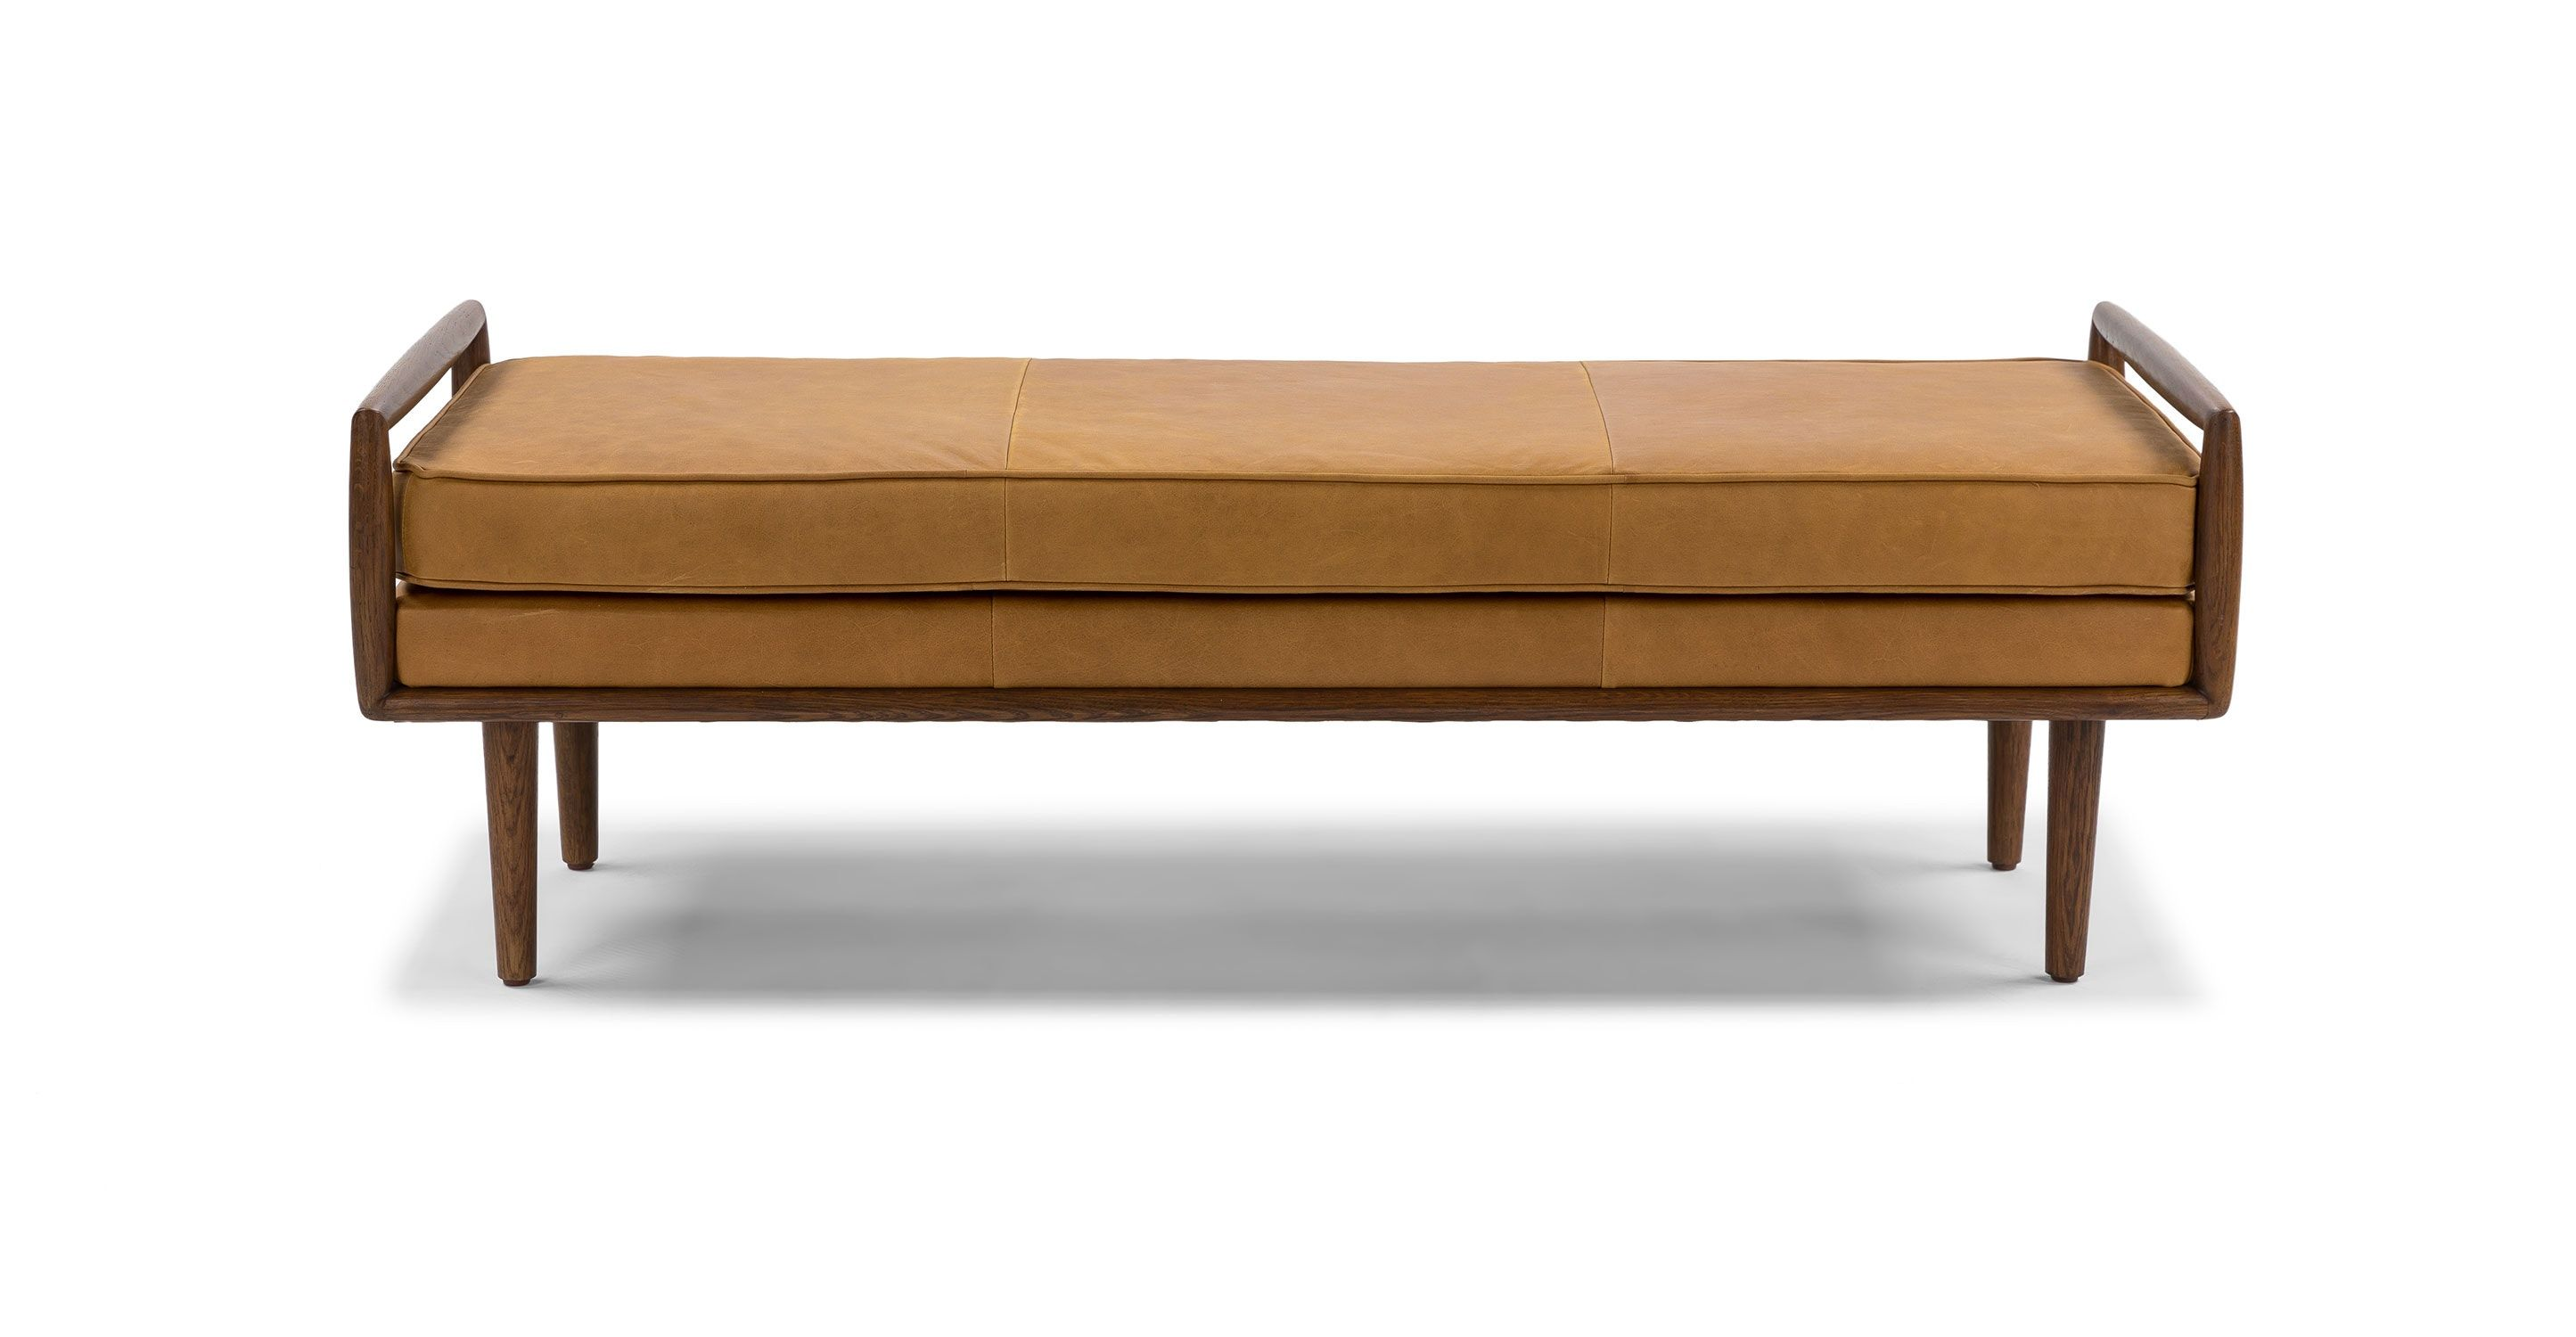 Ansa Charme Tan Bench Bedroom Bench Modern Mid Century Bedroom Furniture Mid Century Bench